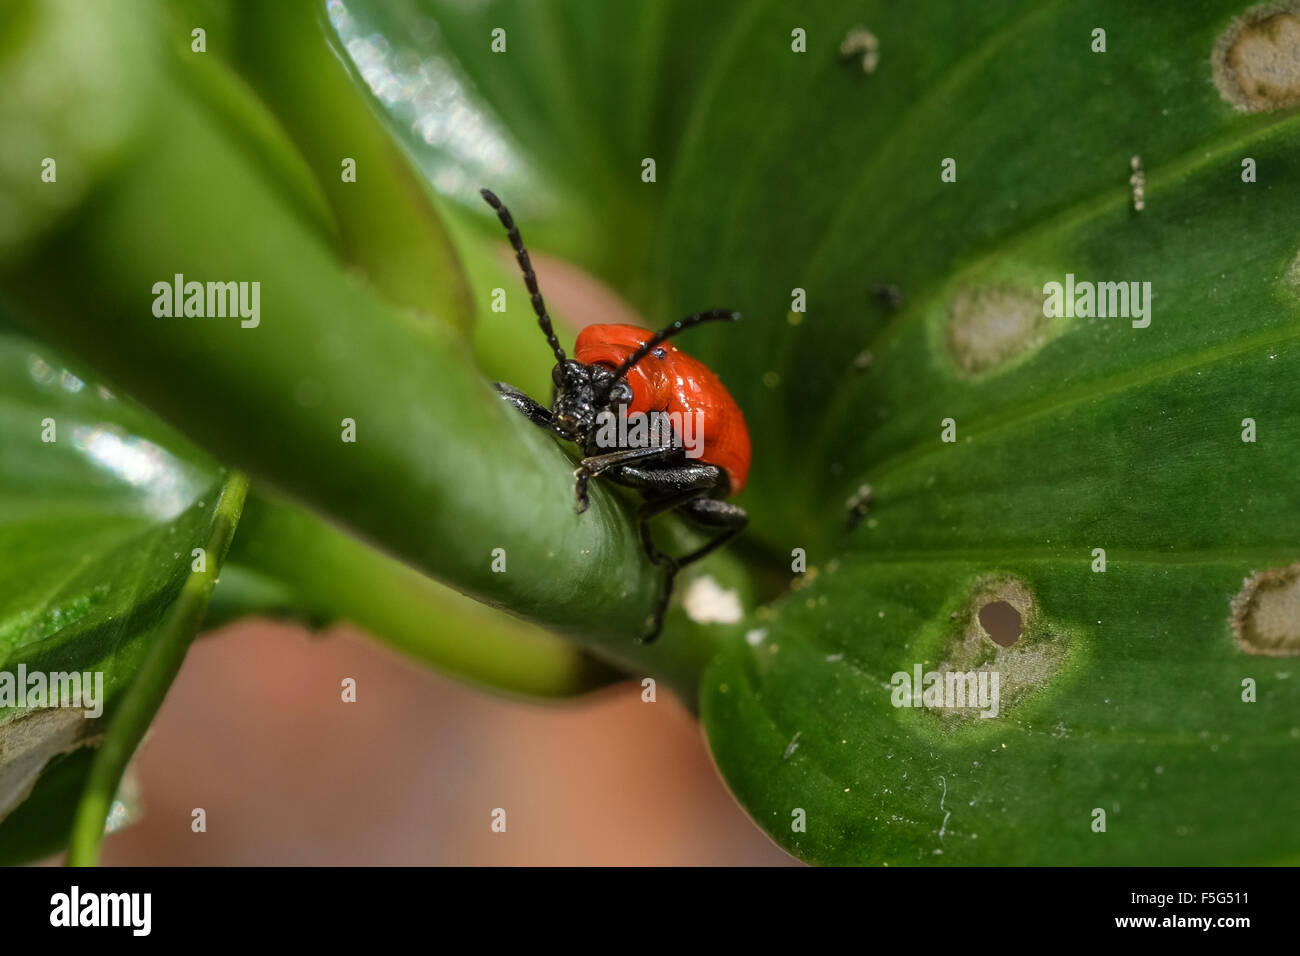 beetle leaves stockfotos beetle leaves bilder alamy. Black Bedroom Furniture Sets. Home Design Ideas